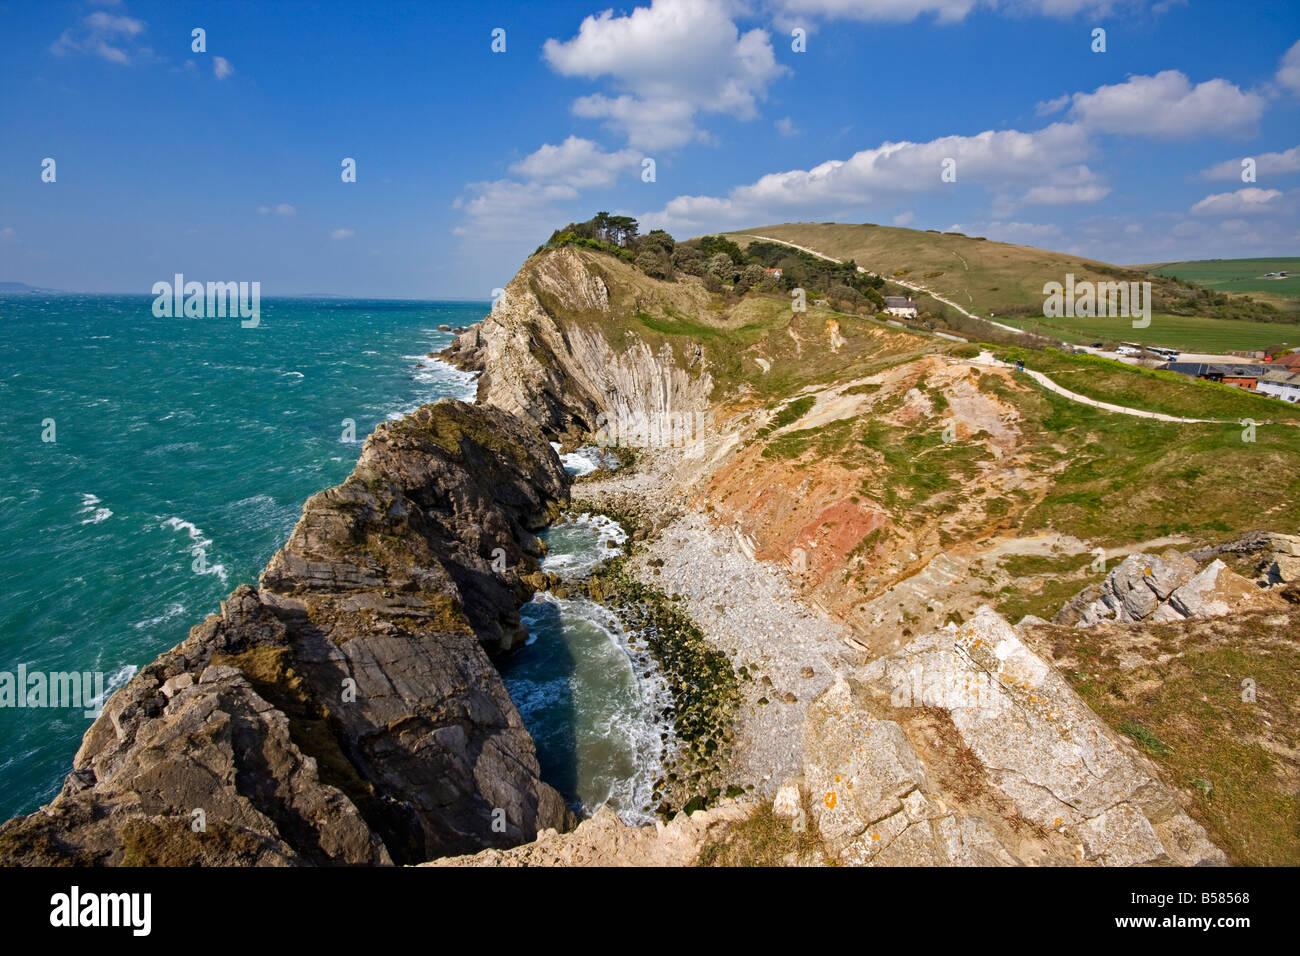 Stair Hole, Lulworth Cove, Dorset, England, United Kingdom, Europe - Stock Image